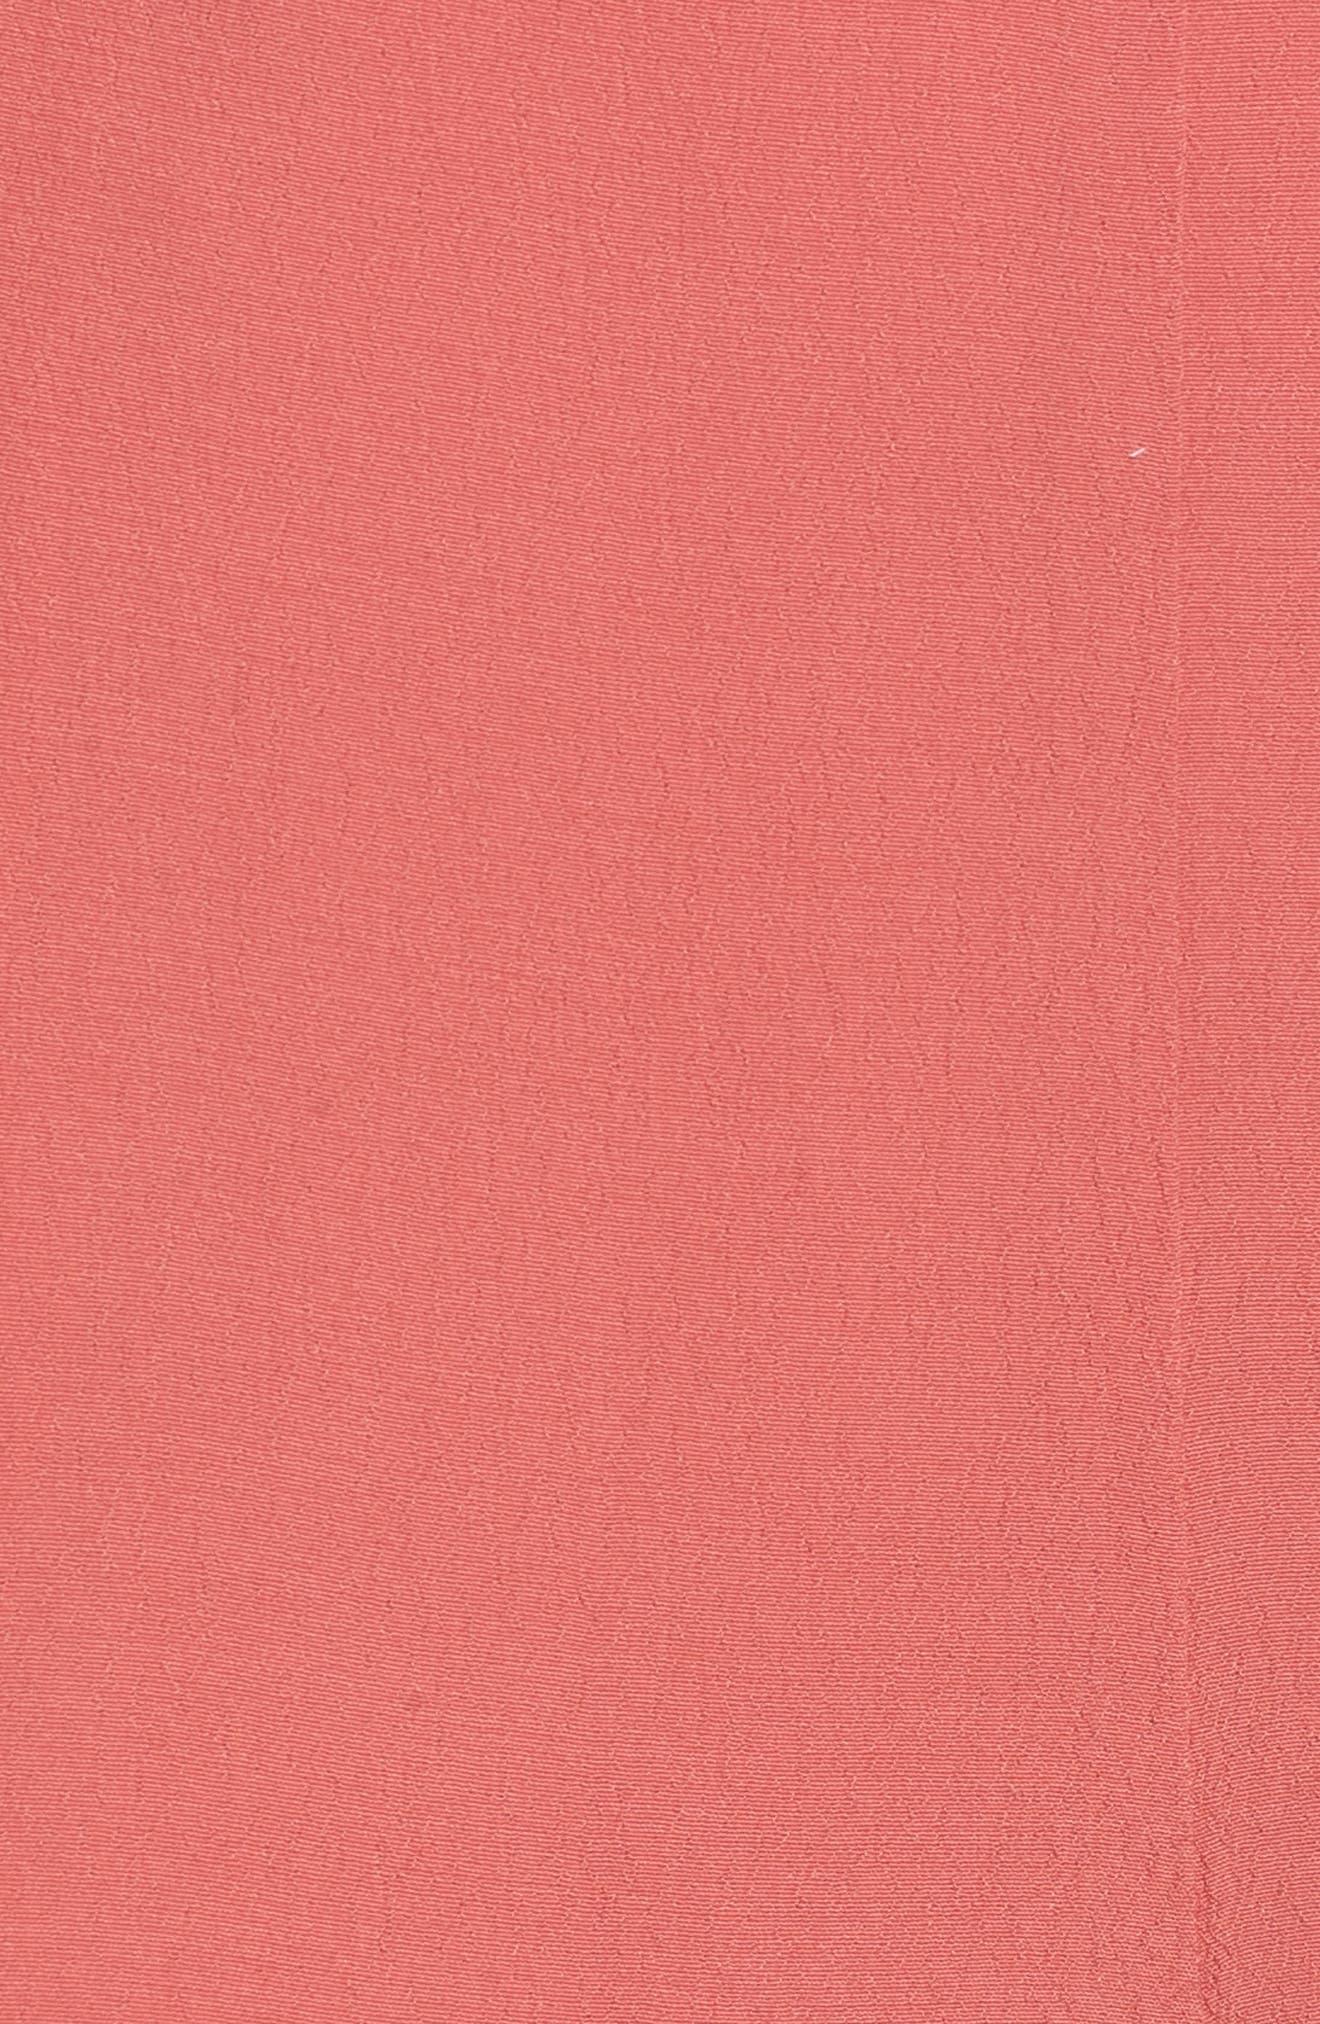 High Waist Crop Wide Leg Pants,                             Alternate thumbnail 6, color,                             Coral Faded